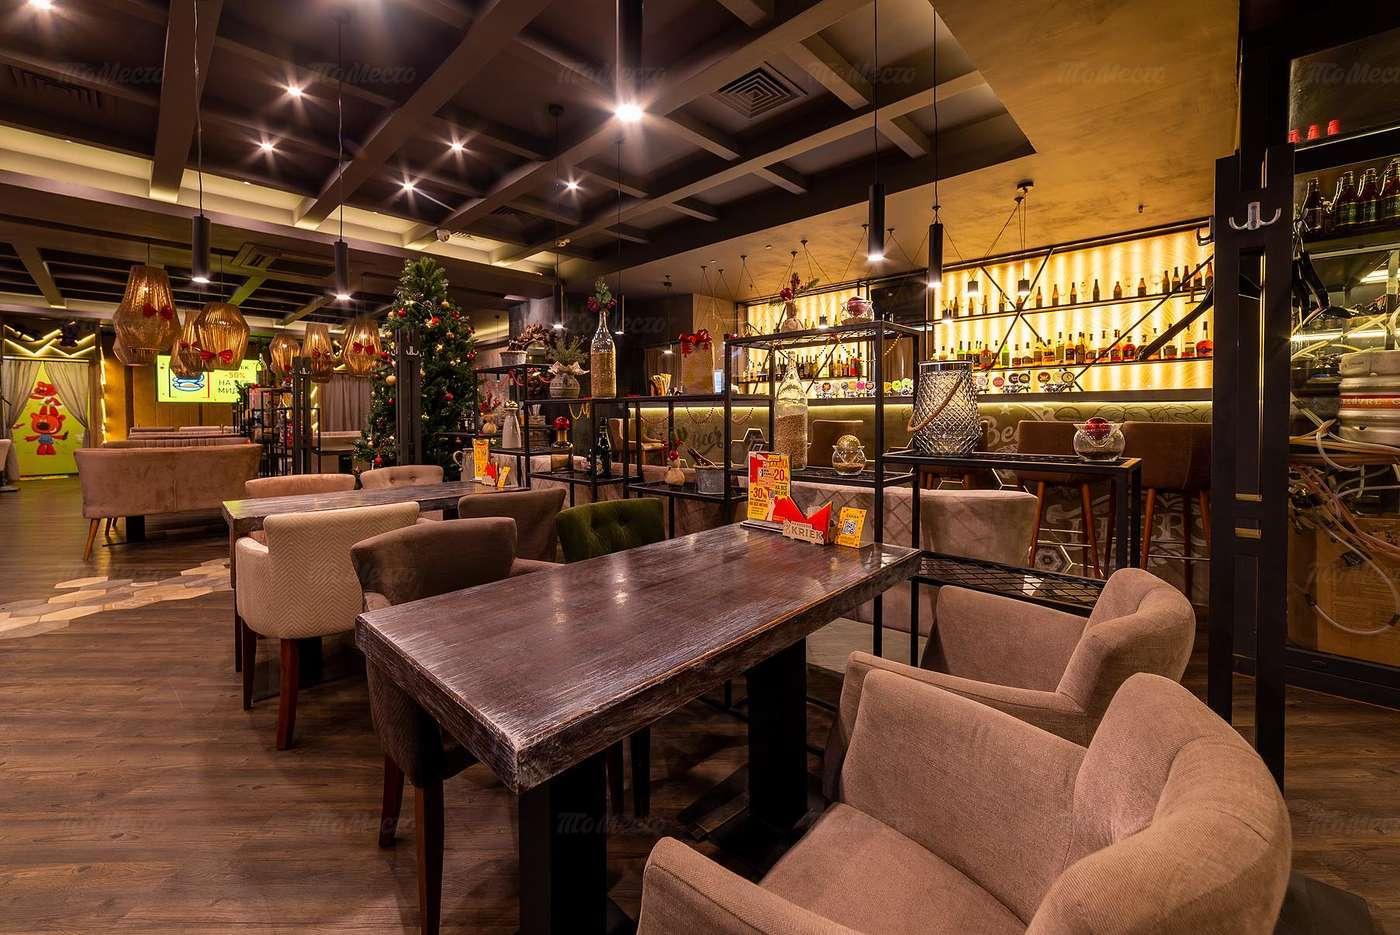 Ресторан Брассерия Крик (Brasserie Kriek) на Коломяжском проспекте фото 4